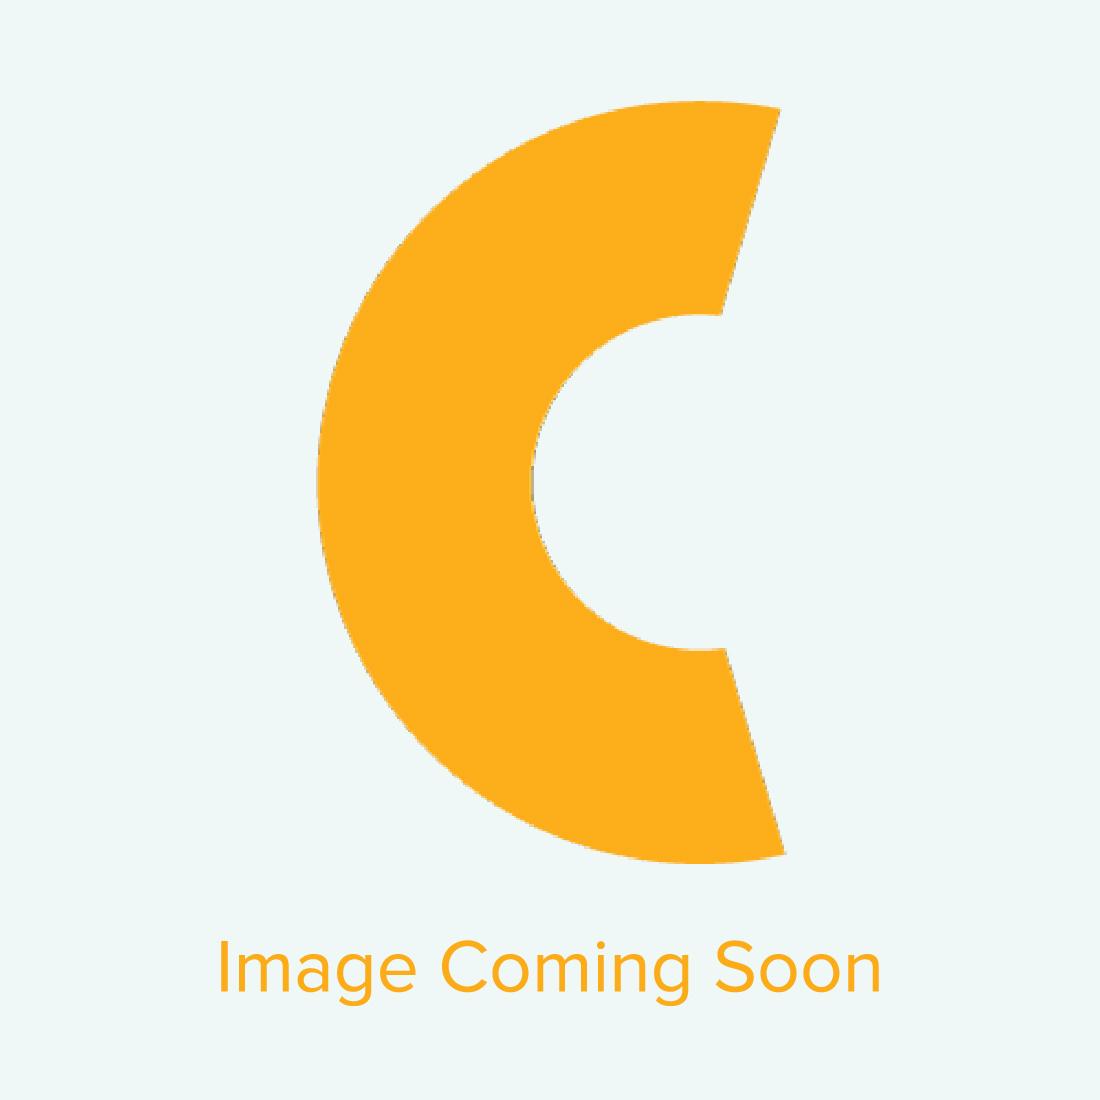 "Sublimation Award Plaque - Cherry Ogee Edge - 9"" x 12"""